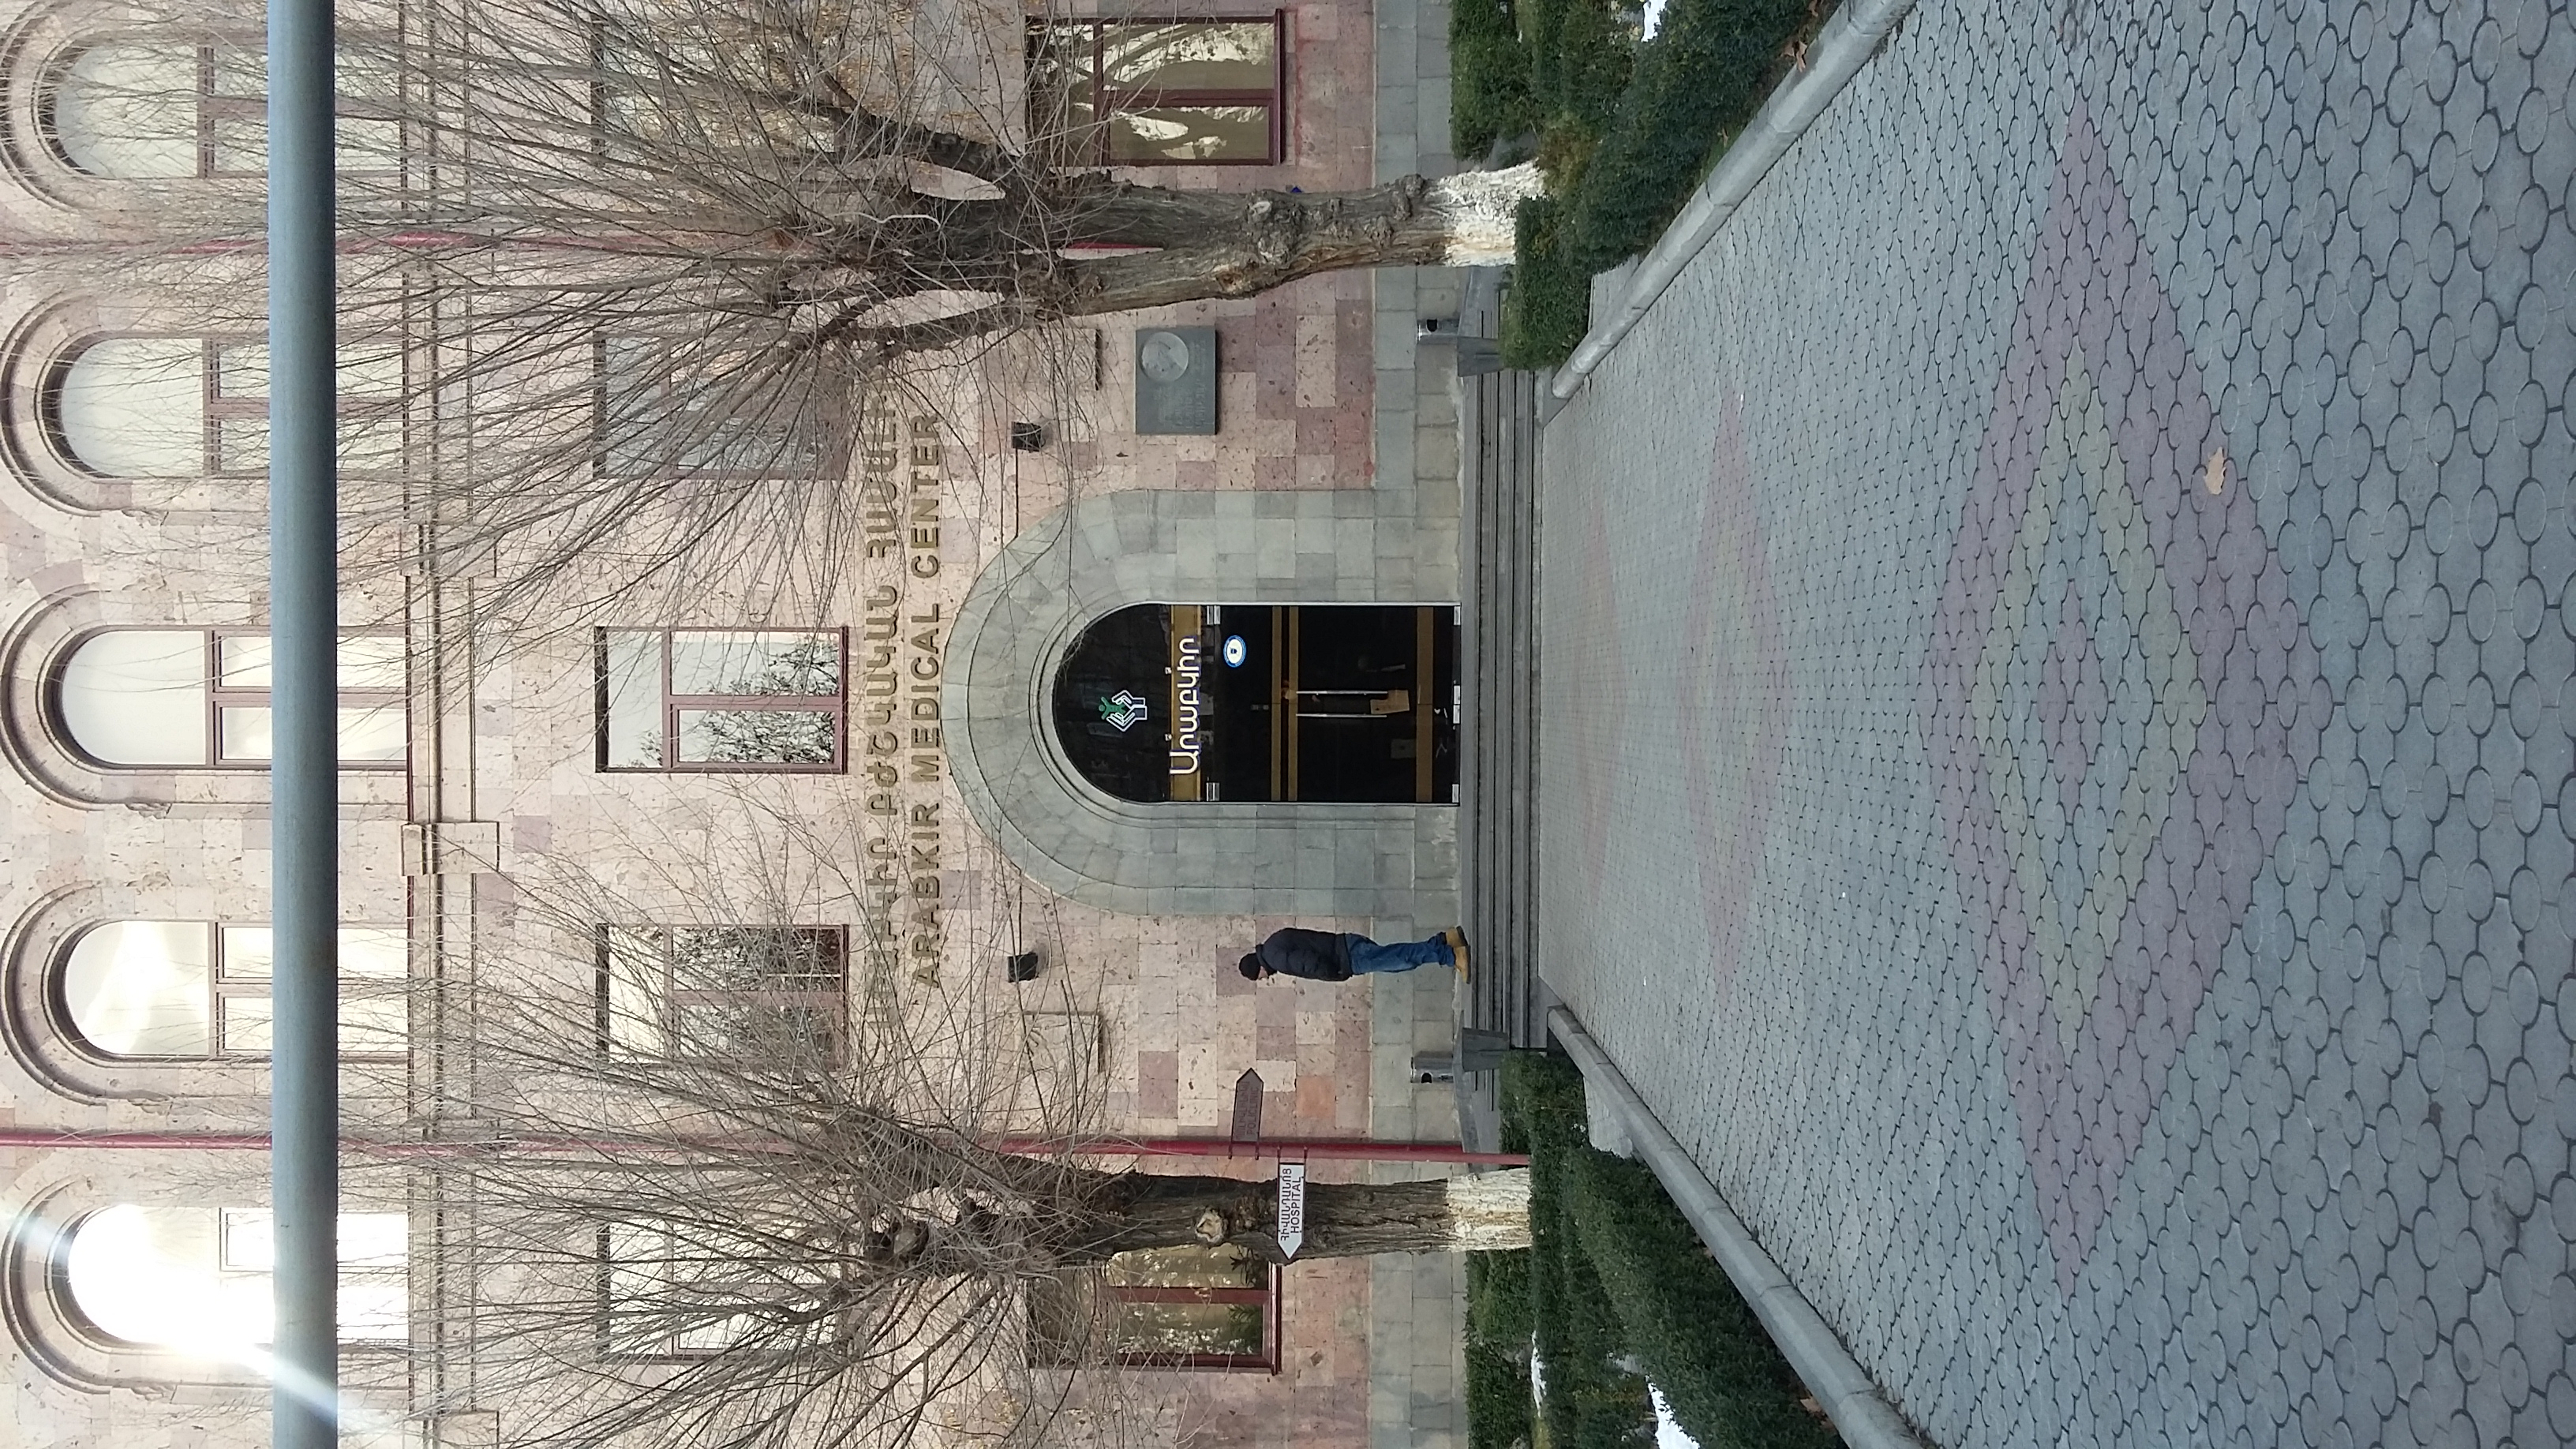 holder of this work, hereby publish it under the following license: English Arabkir Medical Center, Yerevan Armenian «Արաբկիր» բժշկական կենտրոն, Երևան